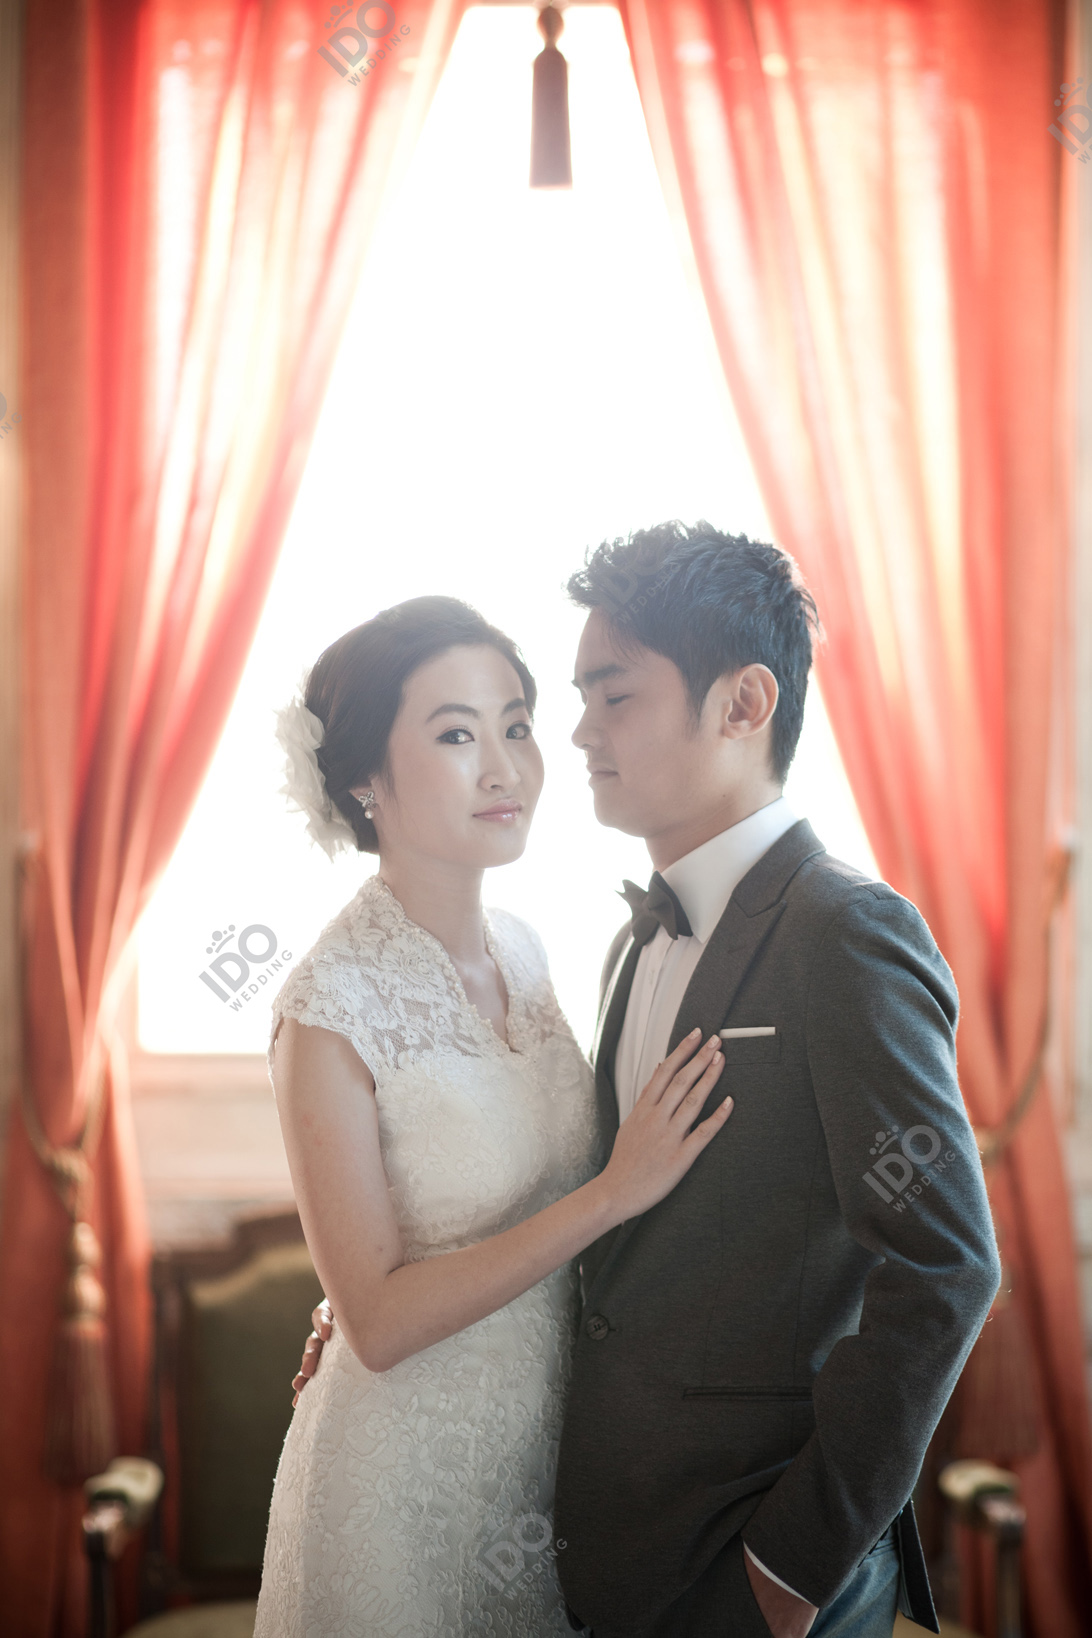 Cerita Korea Panas - Cerita panas, Cerita persetubuhan dengan ibu ...